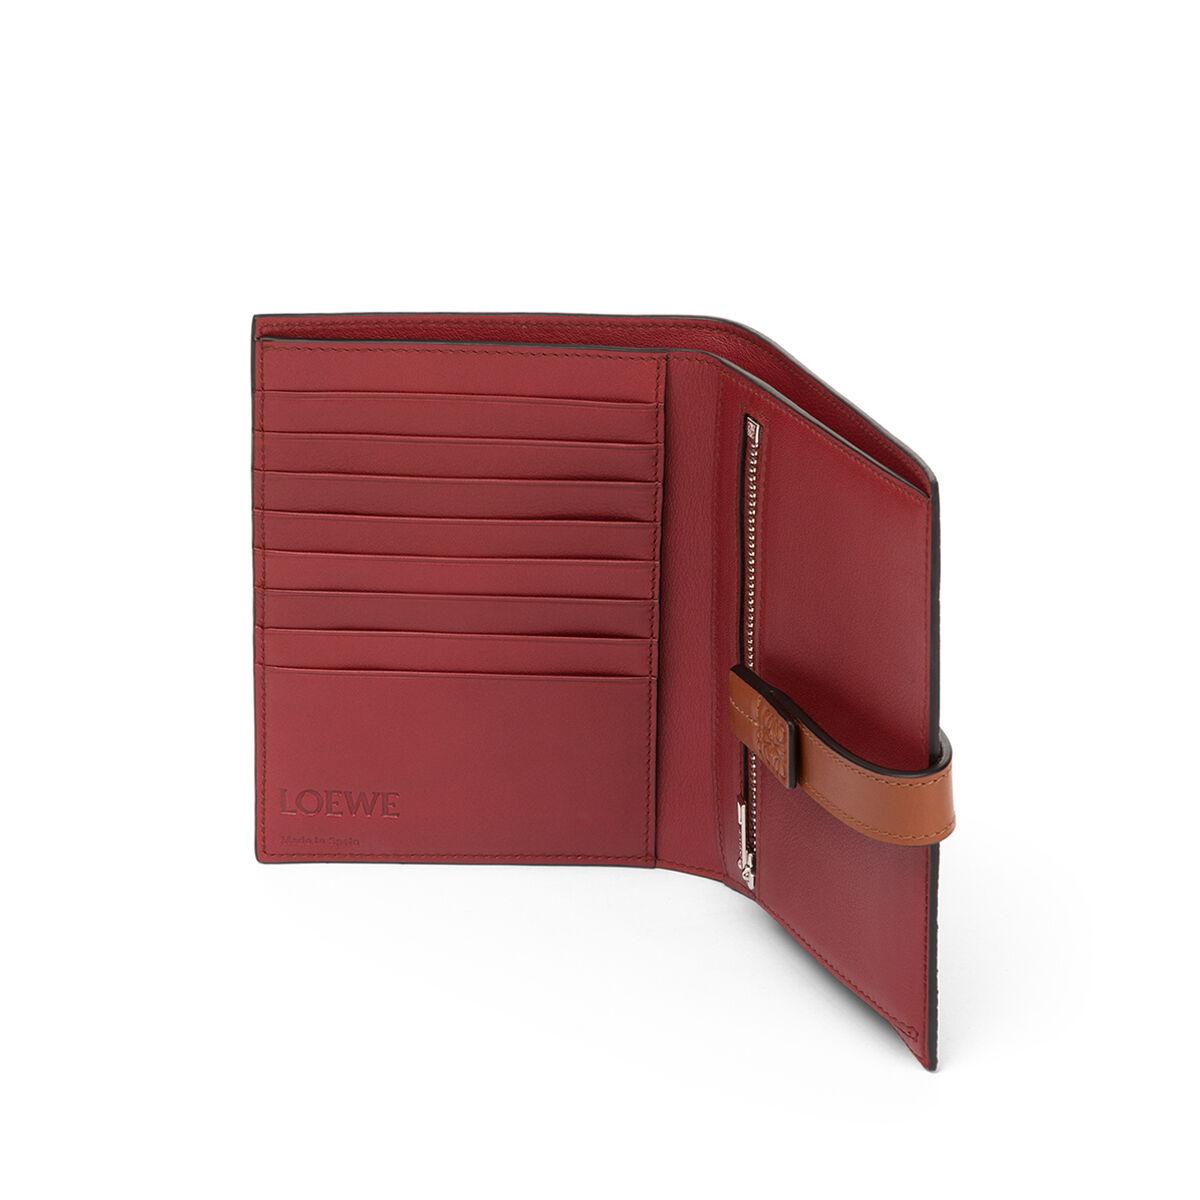 LOEWE Medium Vertical Wallet Light Caramel/Pecan Color  front